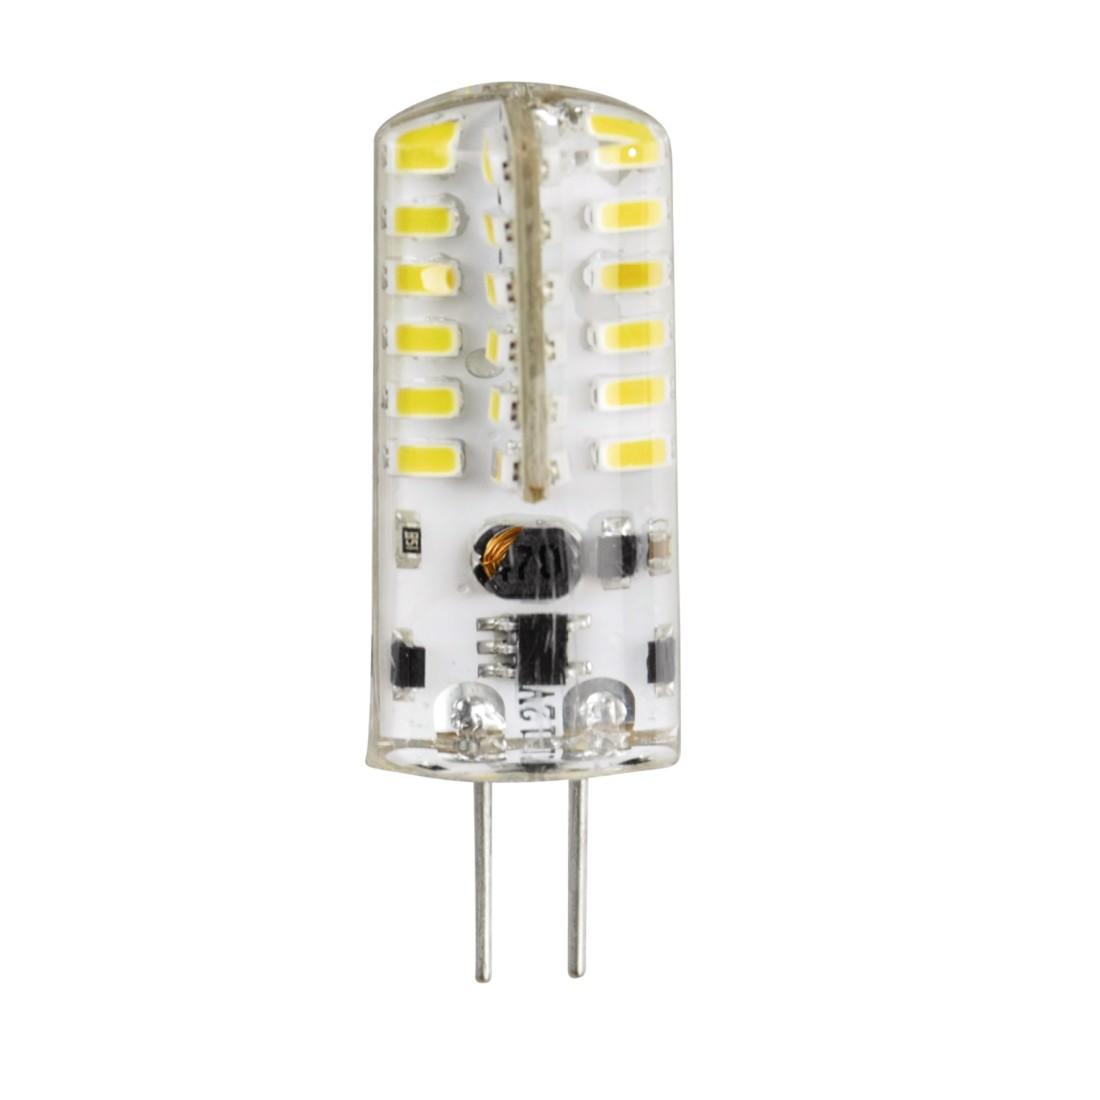 xavax.eu | 00112223 Xavax LED-Lampe, G4, 180lm ersetzt 19W ...